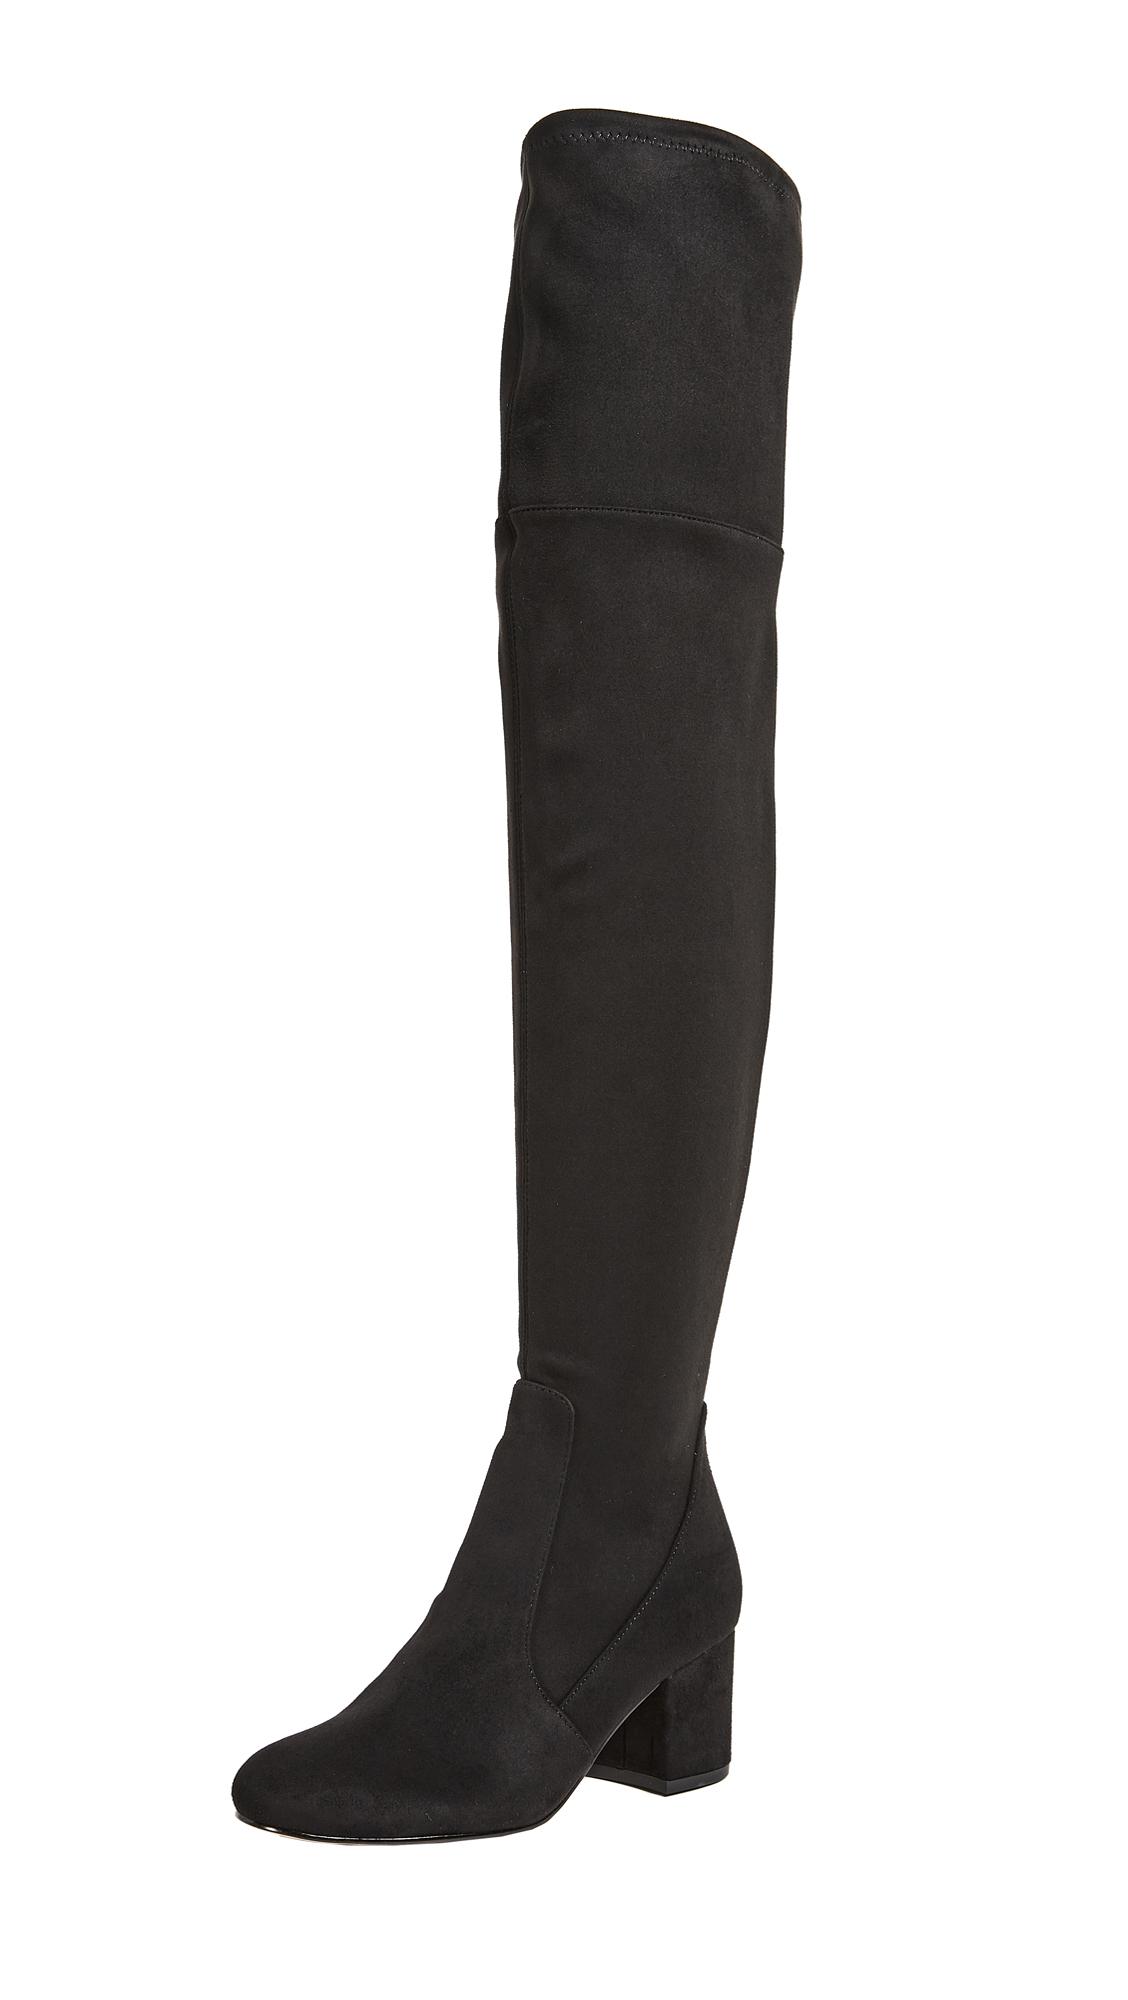 Sam Edelman Varona Thigh High Boots - Black